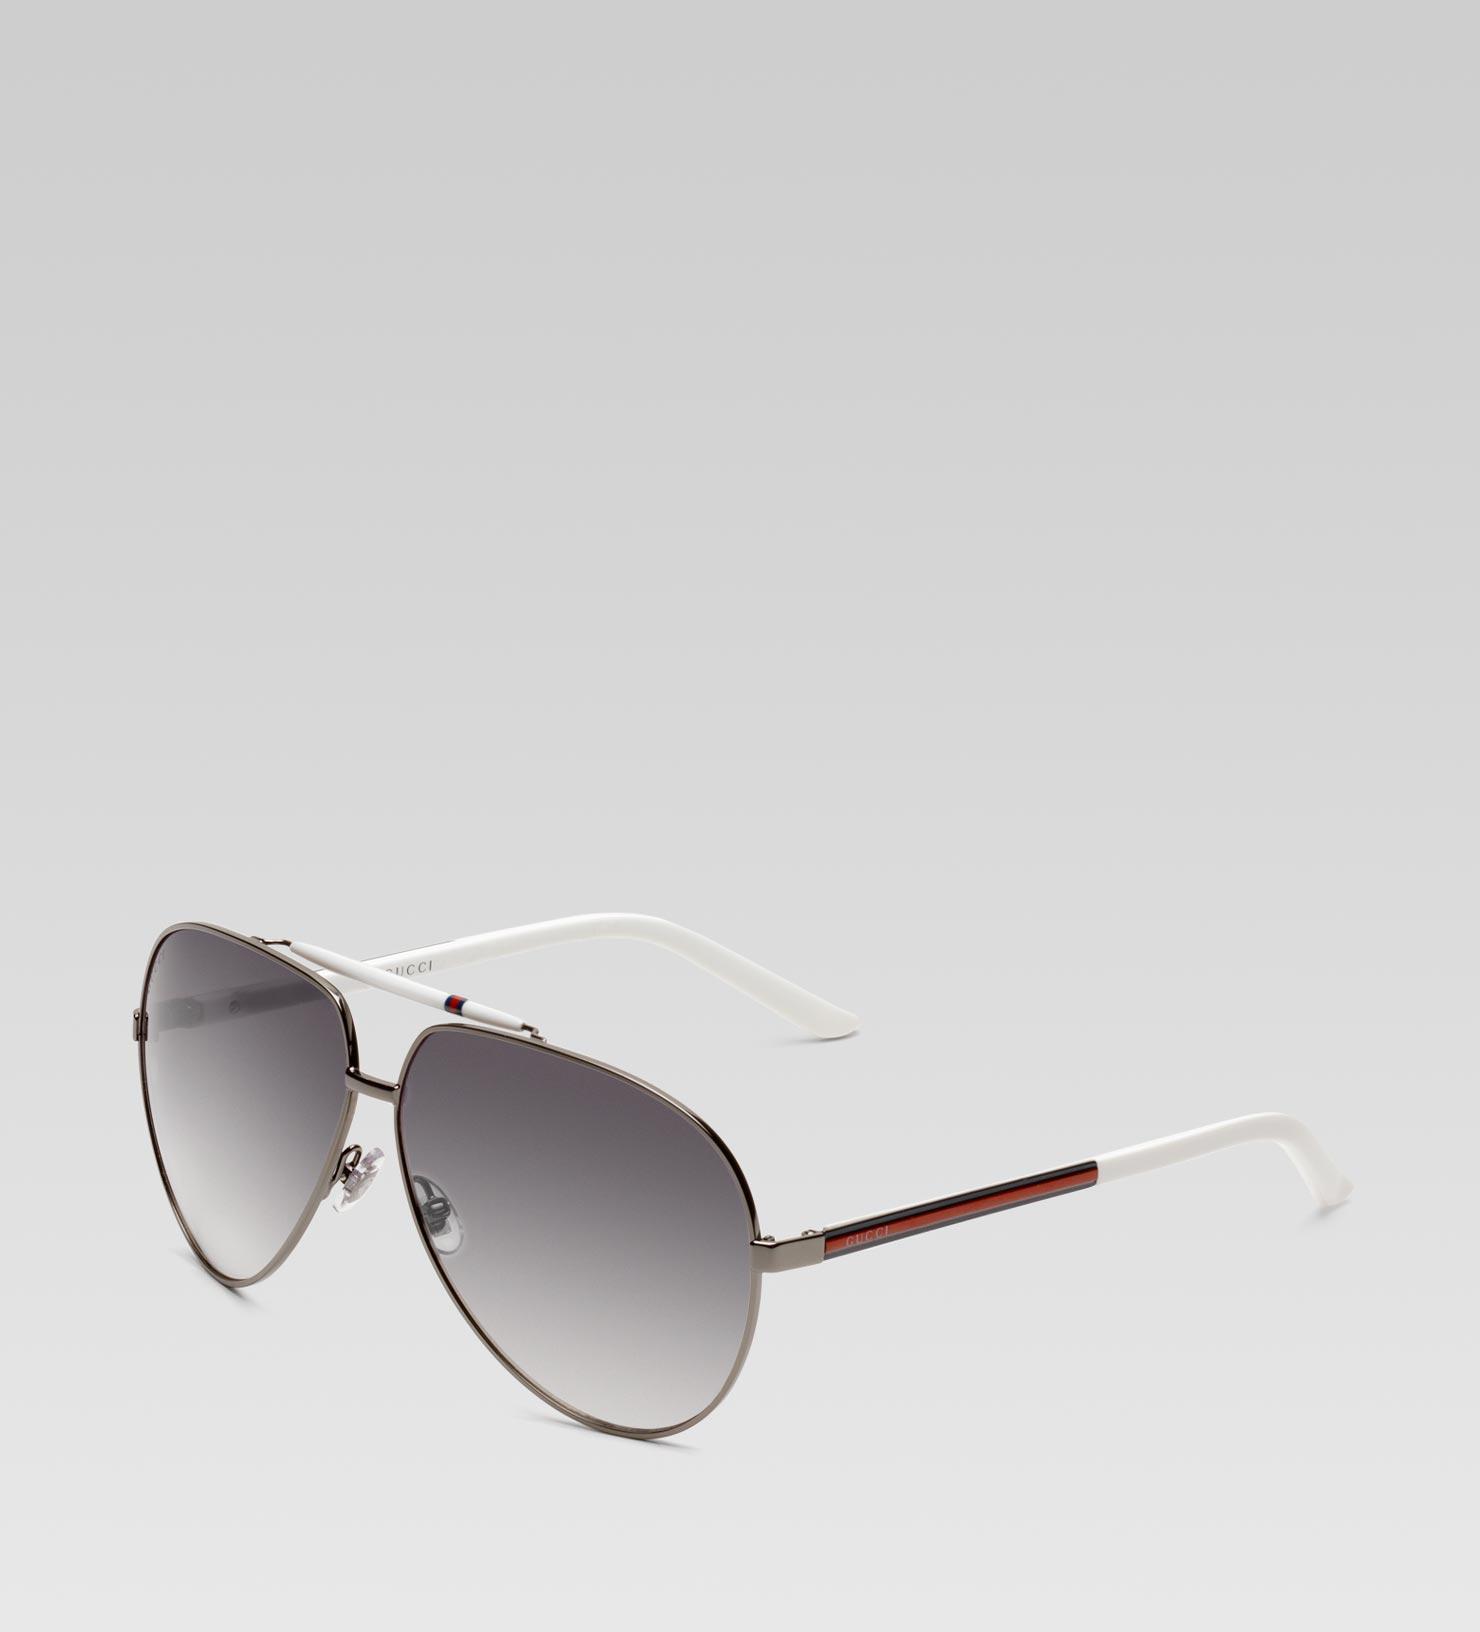 Gucci Medium Aviator Sunglasses With Signature Web Detail On Temple ...